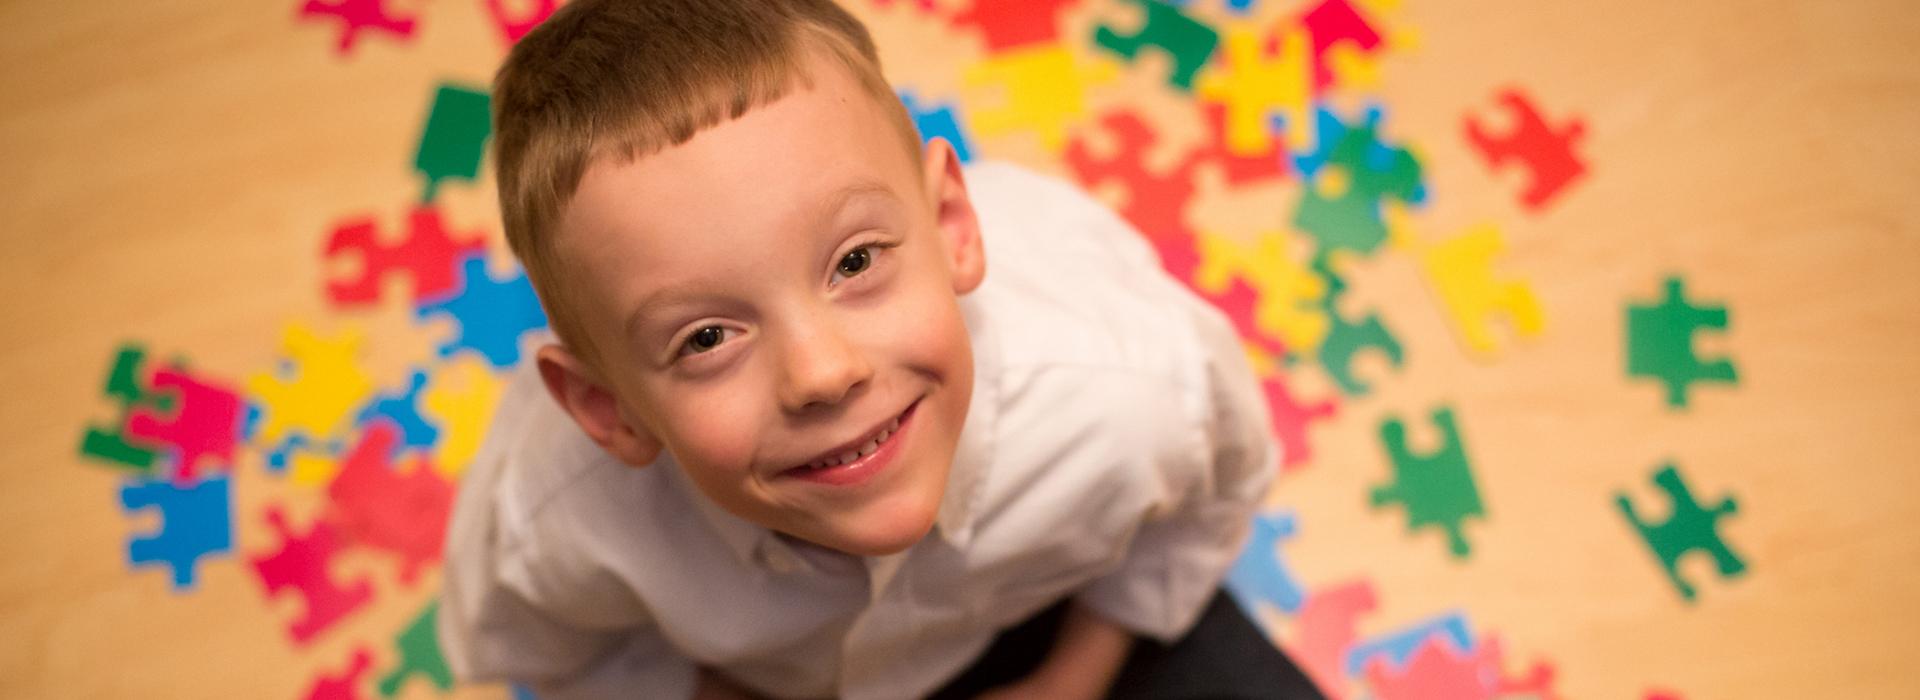 Снятие диагноза аутизм